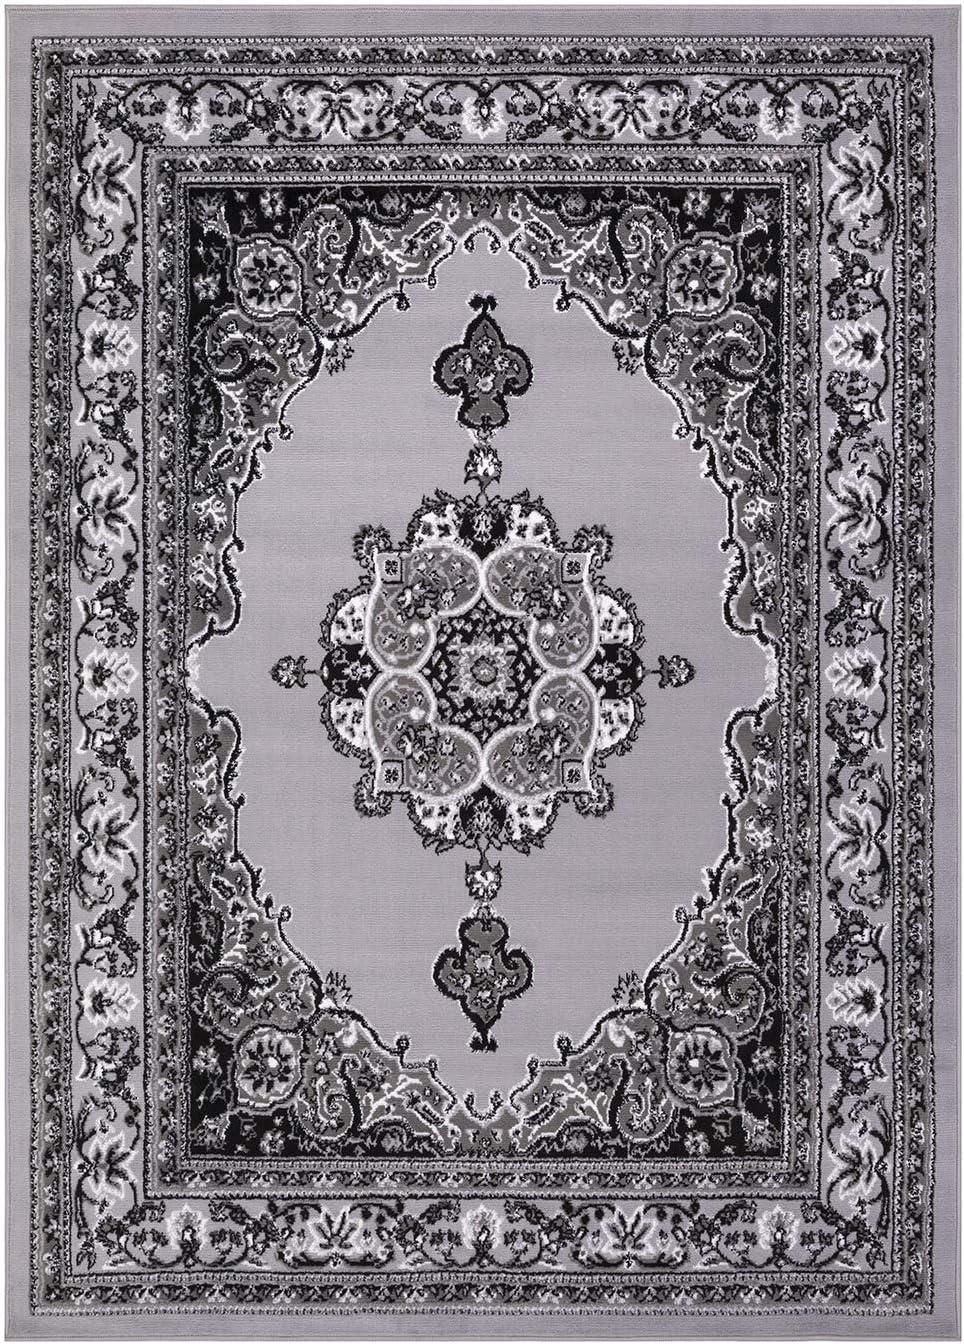 Princess Collection Oriental Medallion Area Rug, 5 2 x 7 2 , 811 Light Grey Light Grey